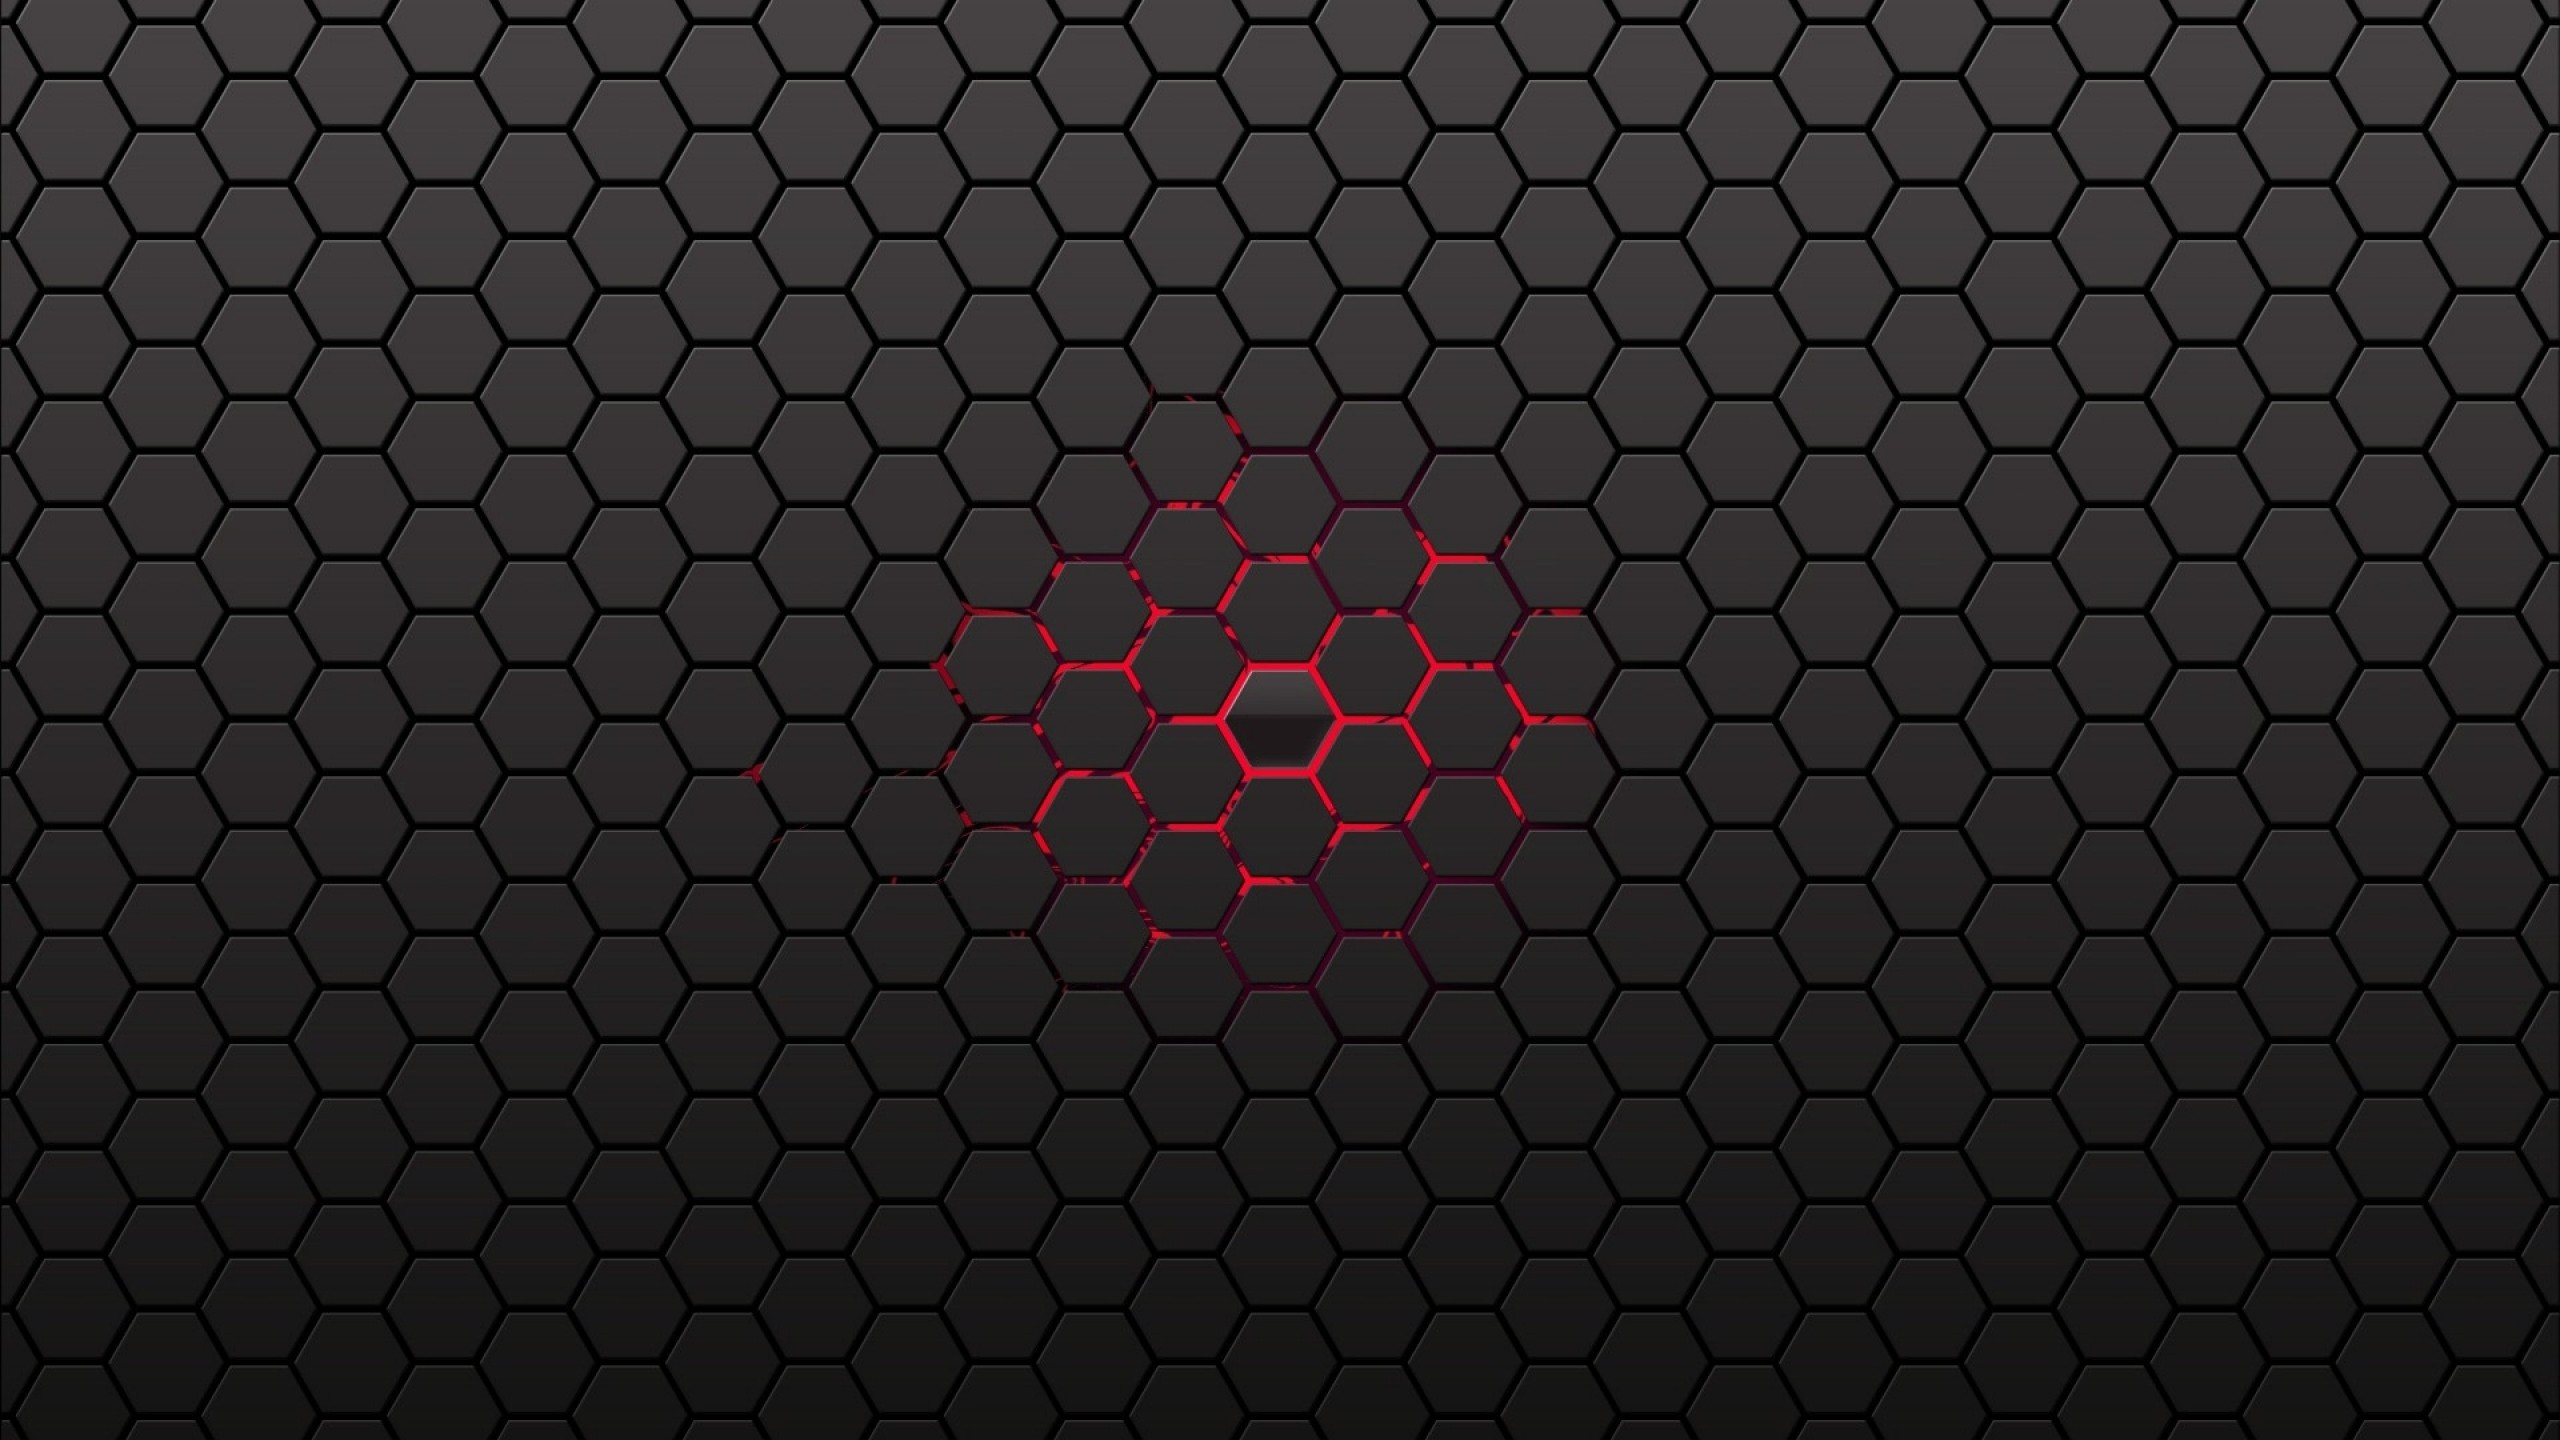 Wallpaper Dark Abstract Wallpaper Hd 2560x1440 Wallpaper Teahub Io